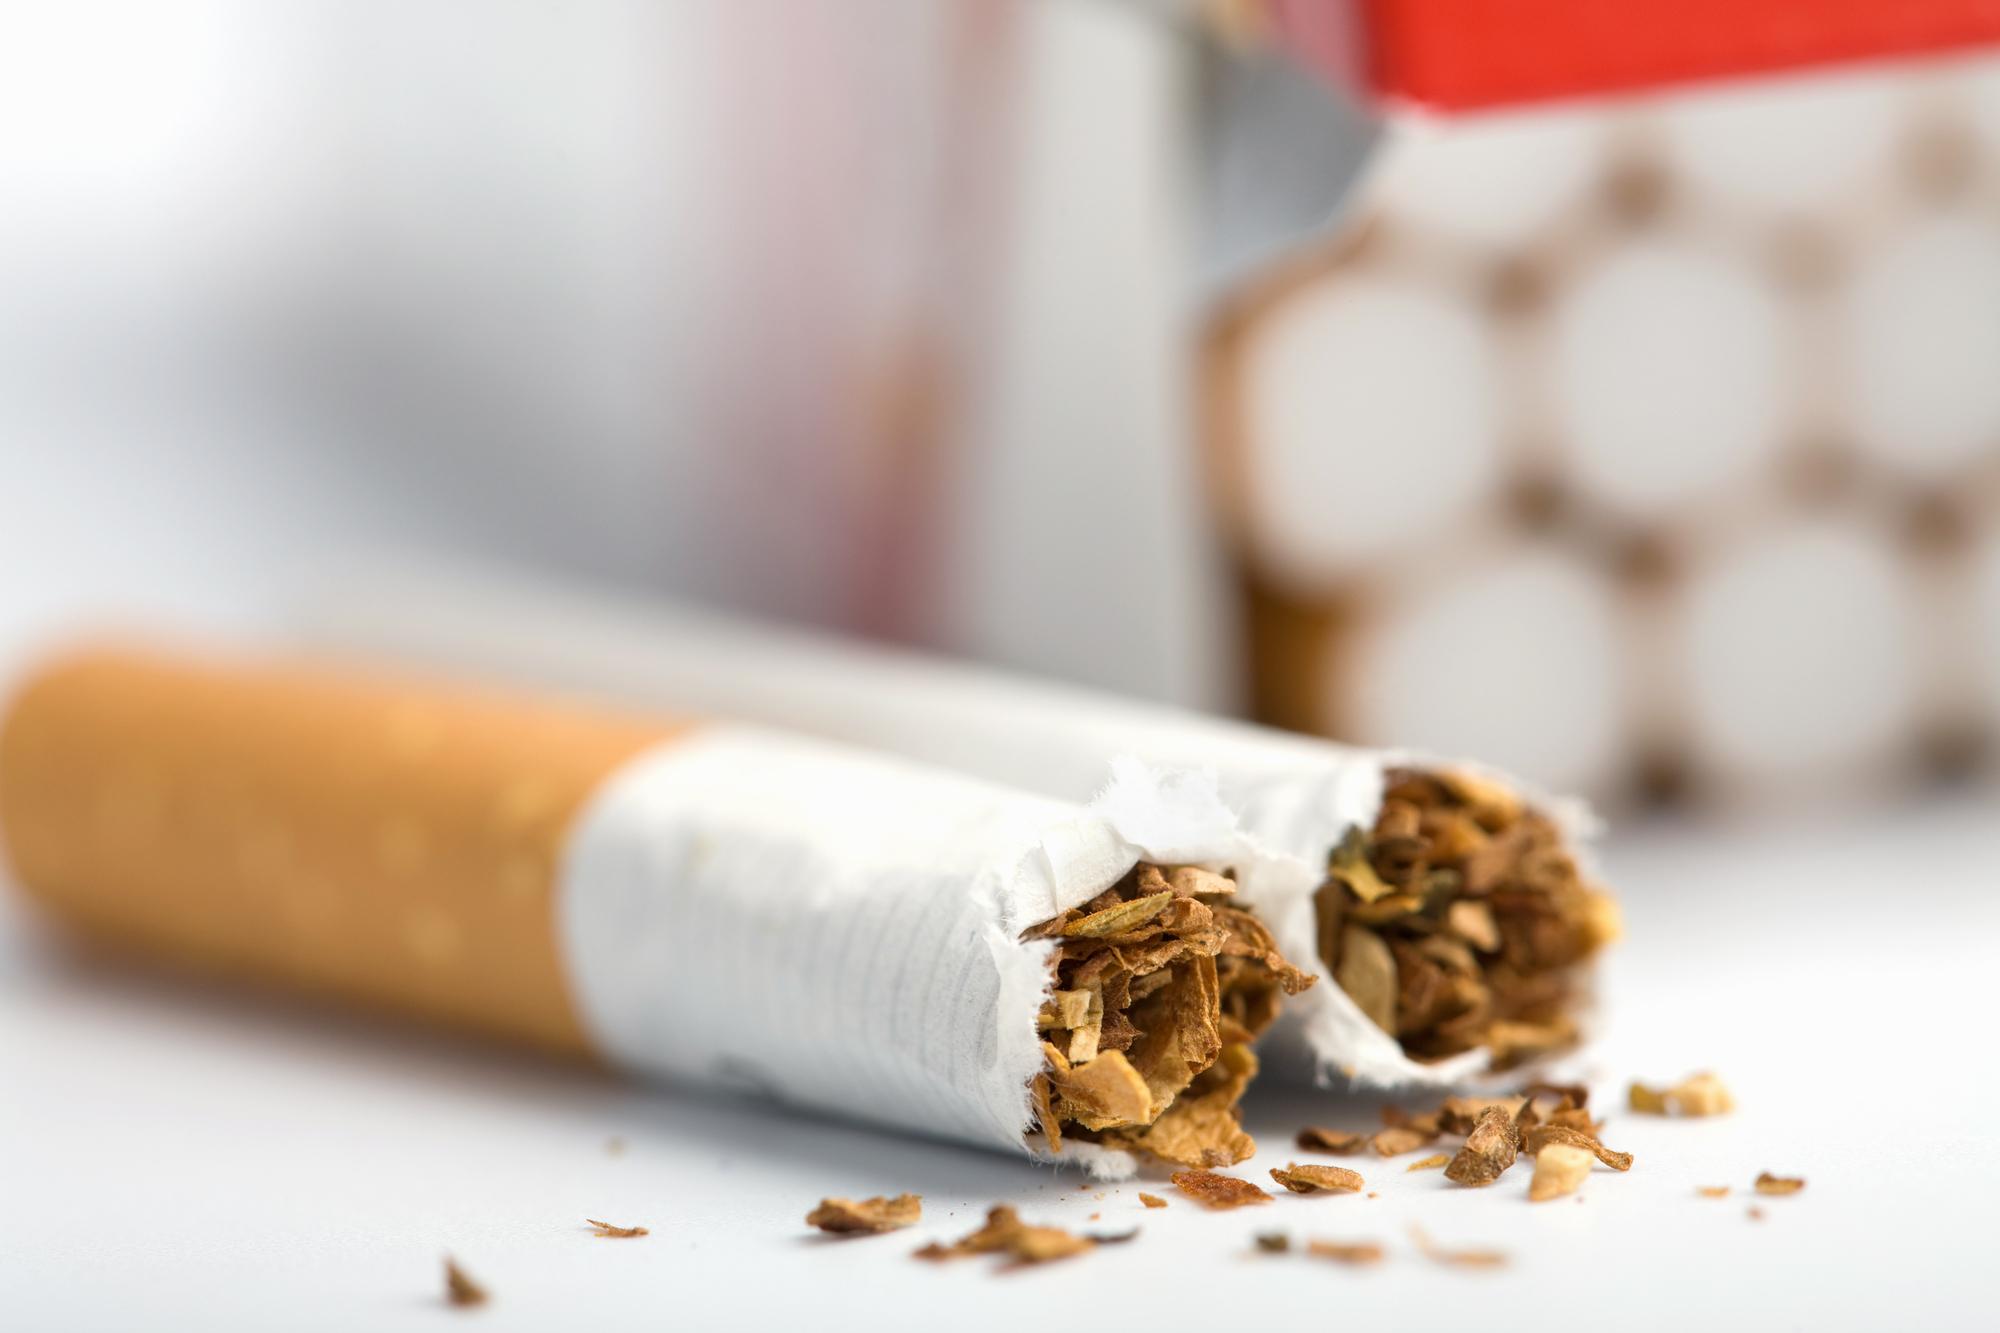 cigarteta